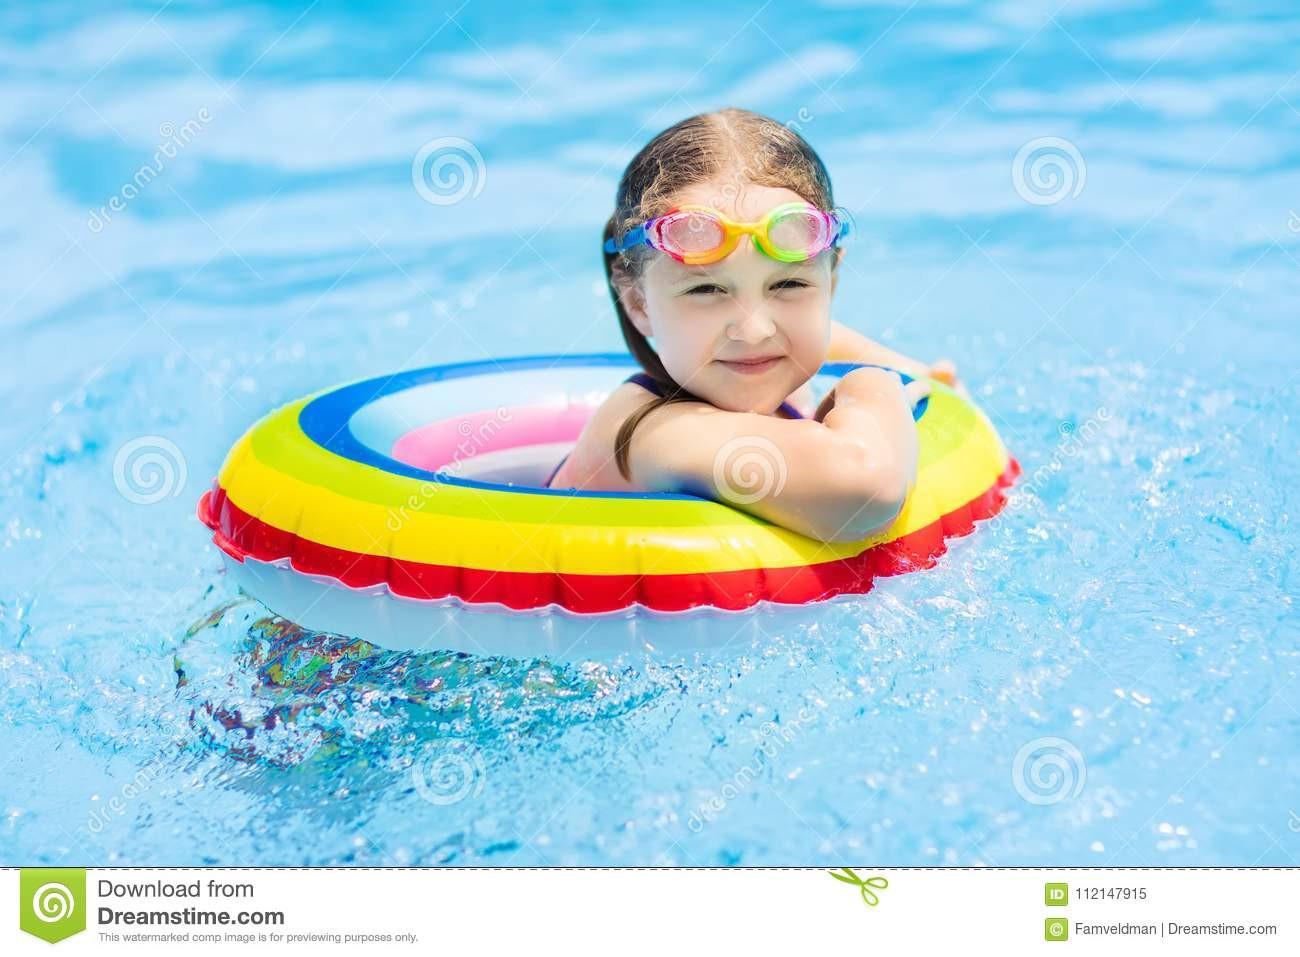 Kids Outdoor Swimming Pool  Child In Swimming Pool Kids Swim Water Play Stock Image